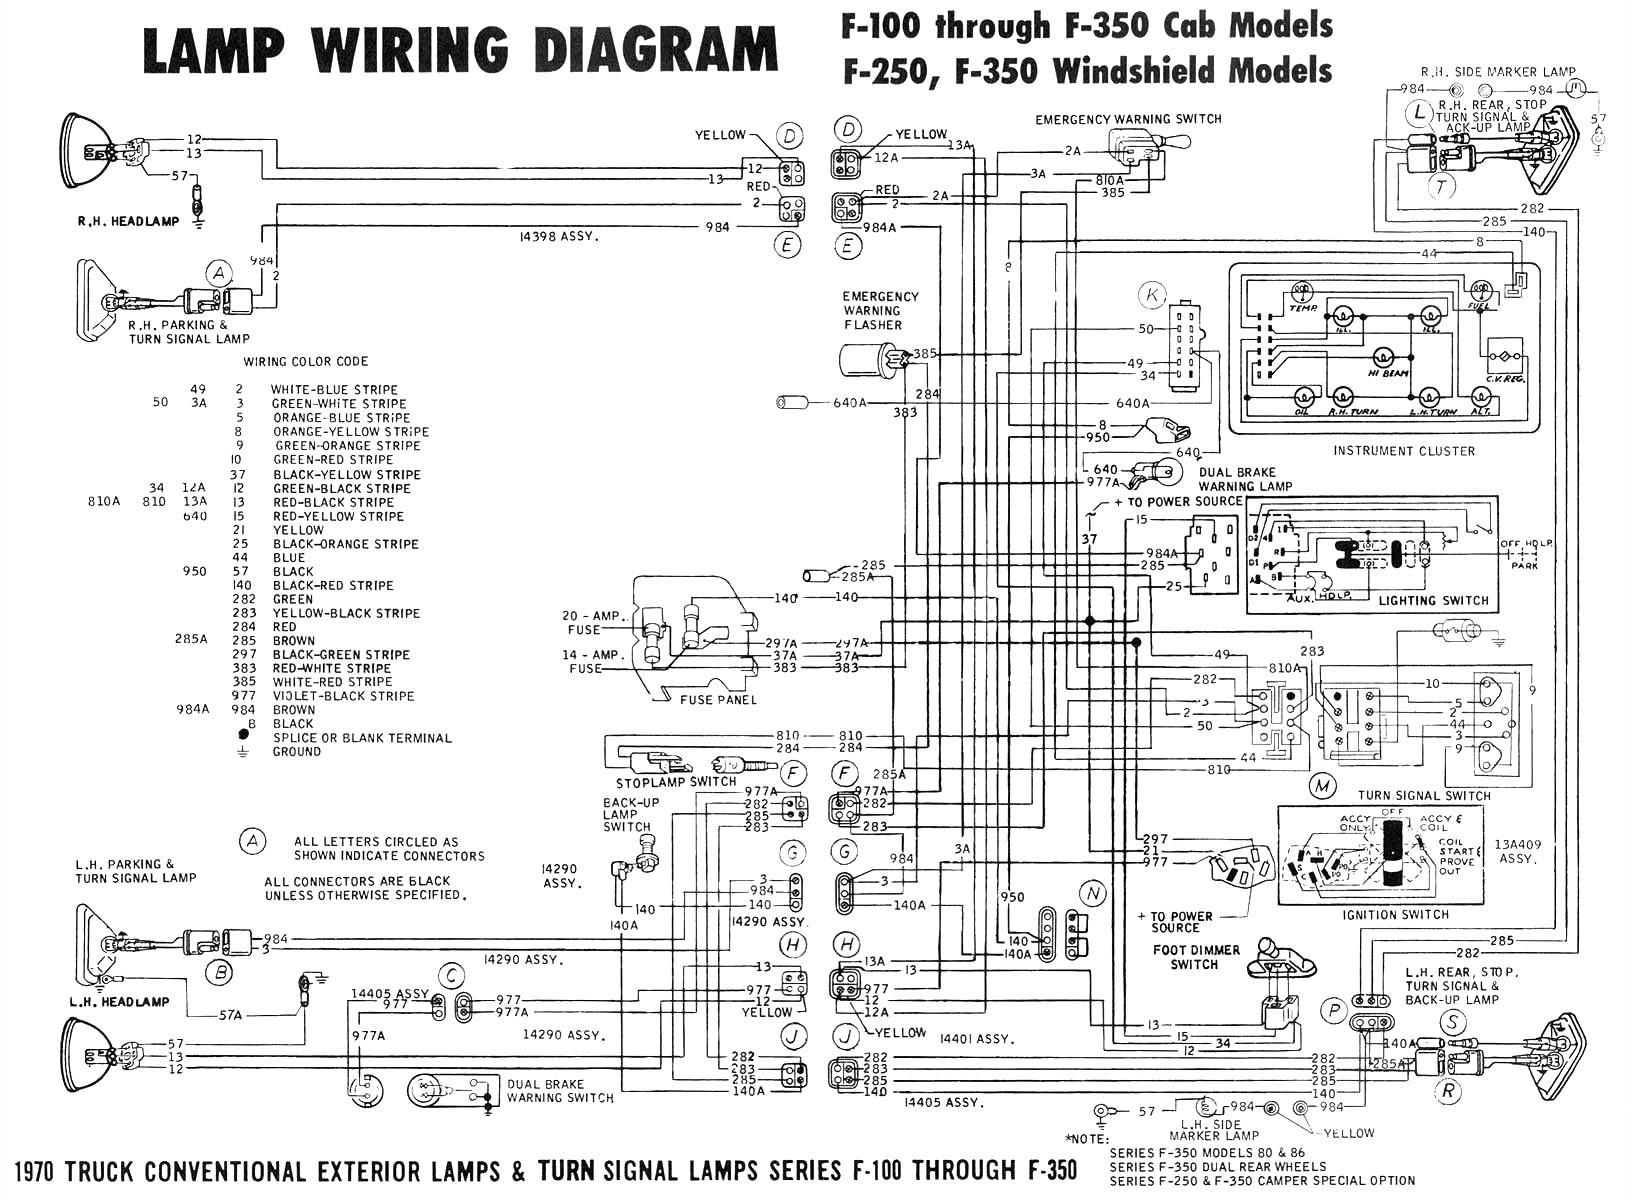 4in2wire plug oldsmobile alternator wiring diagram wiring diagram 4in2wire plug oldsmobile alternator wiring diagram